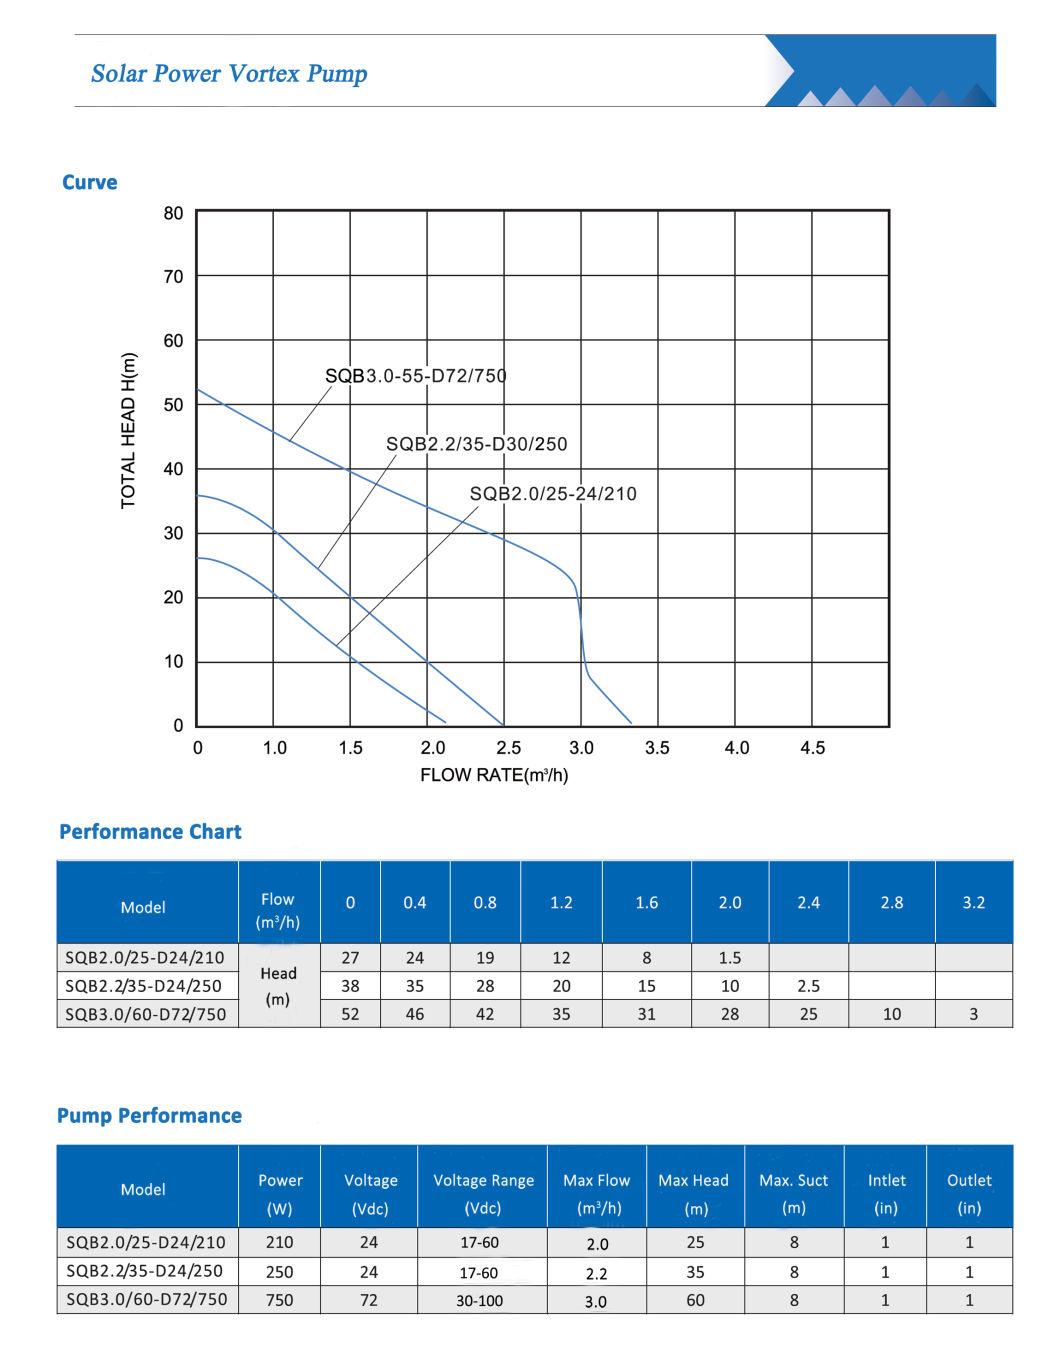 210W-750W Solar Vortex BLDC Water Pump, Booster Pump, Self-Priming Pump with MPPT Controller